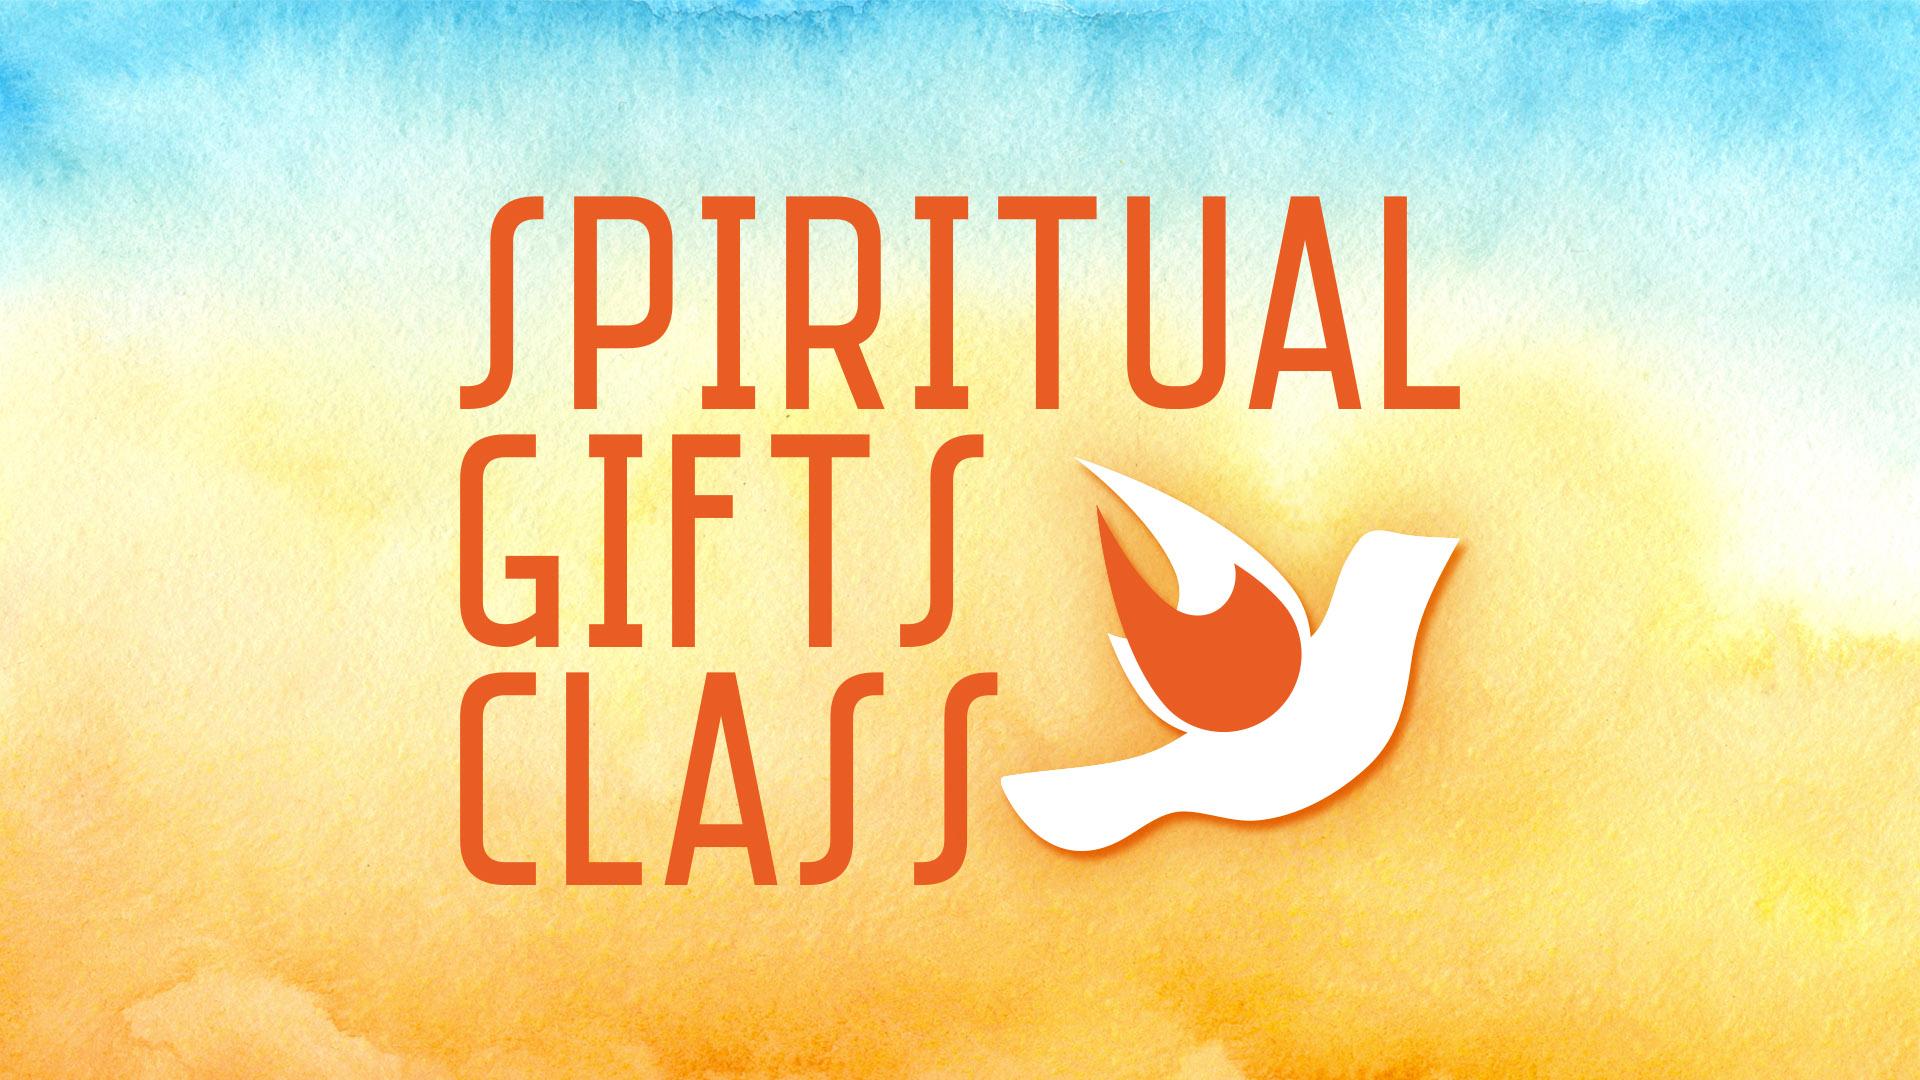 Spiritual gifts class pco